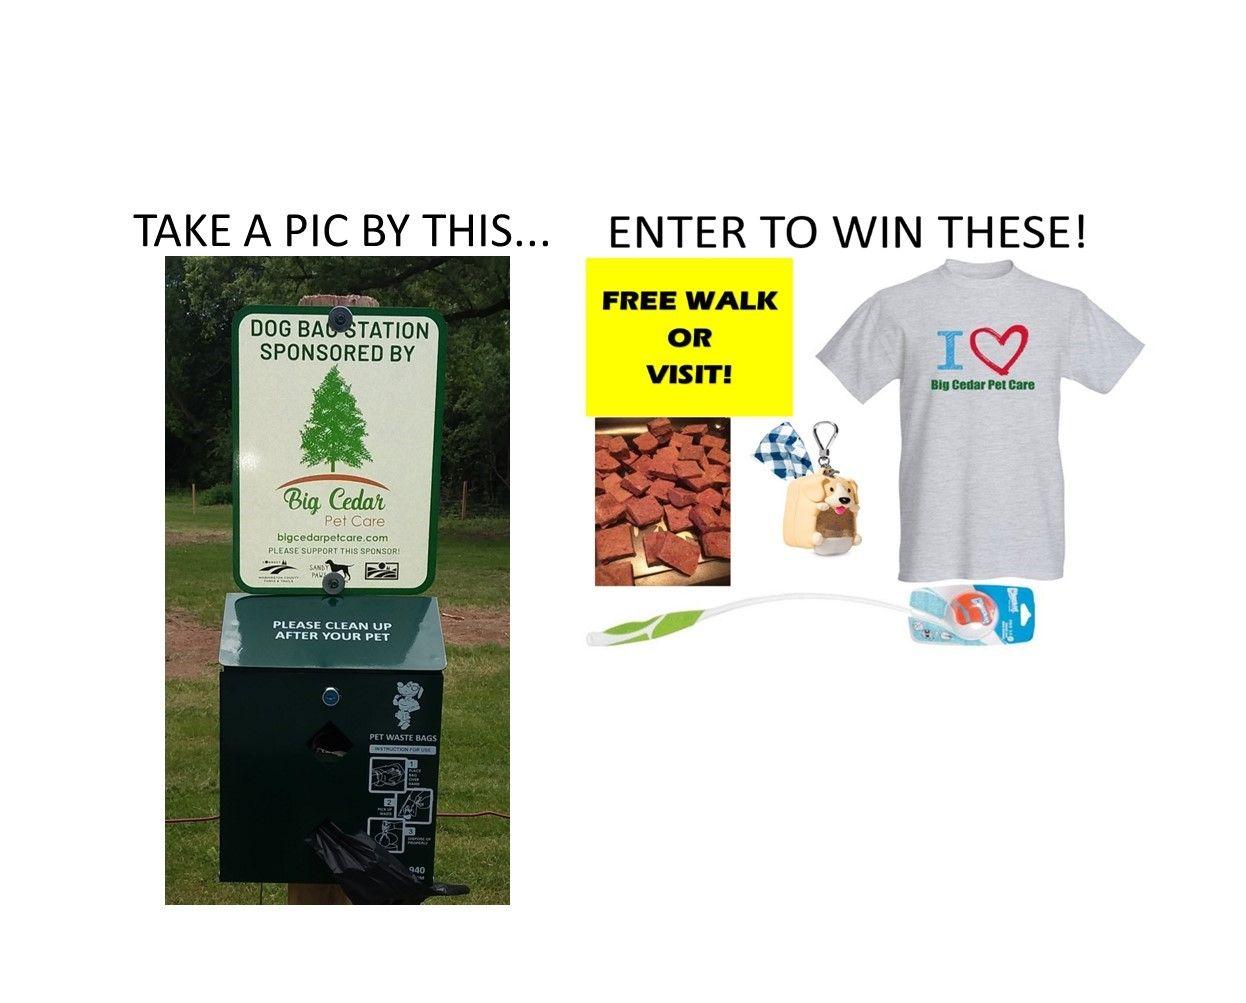 Photo Contest in 2020 Photo contest, Pet car, Dog park